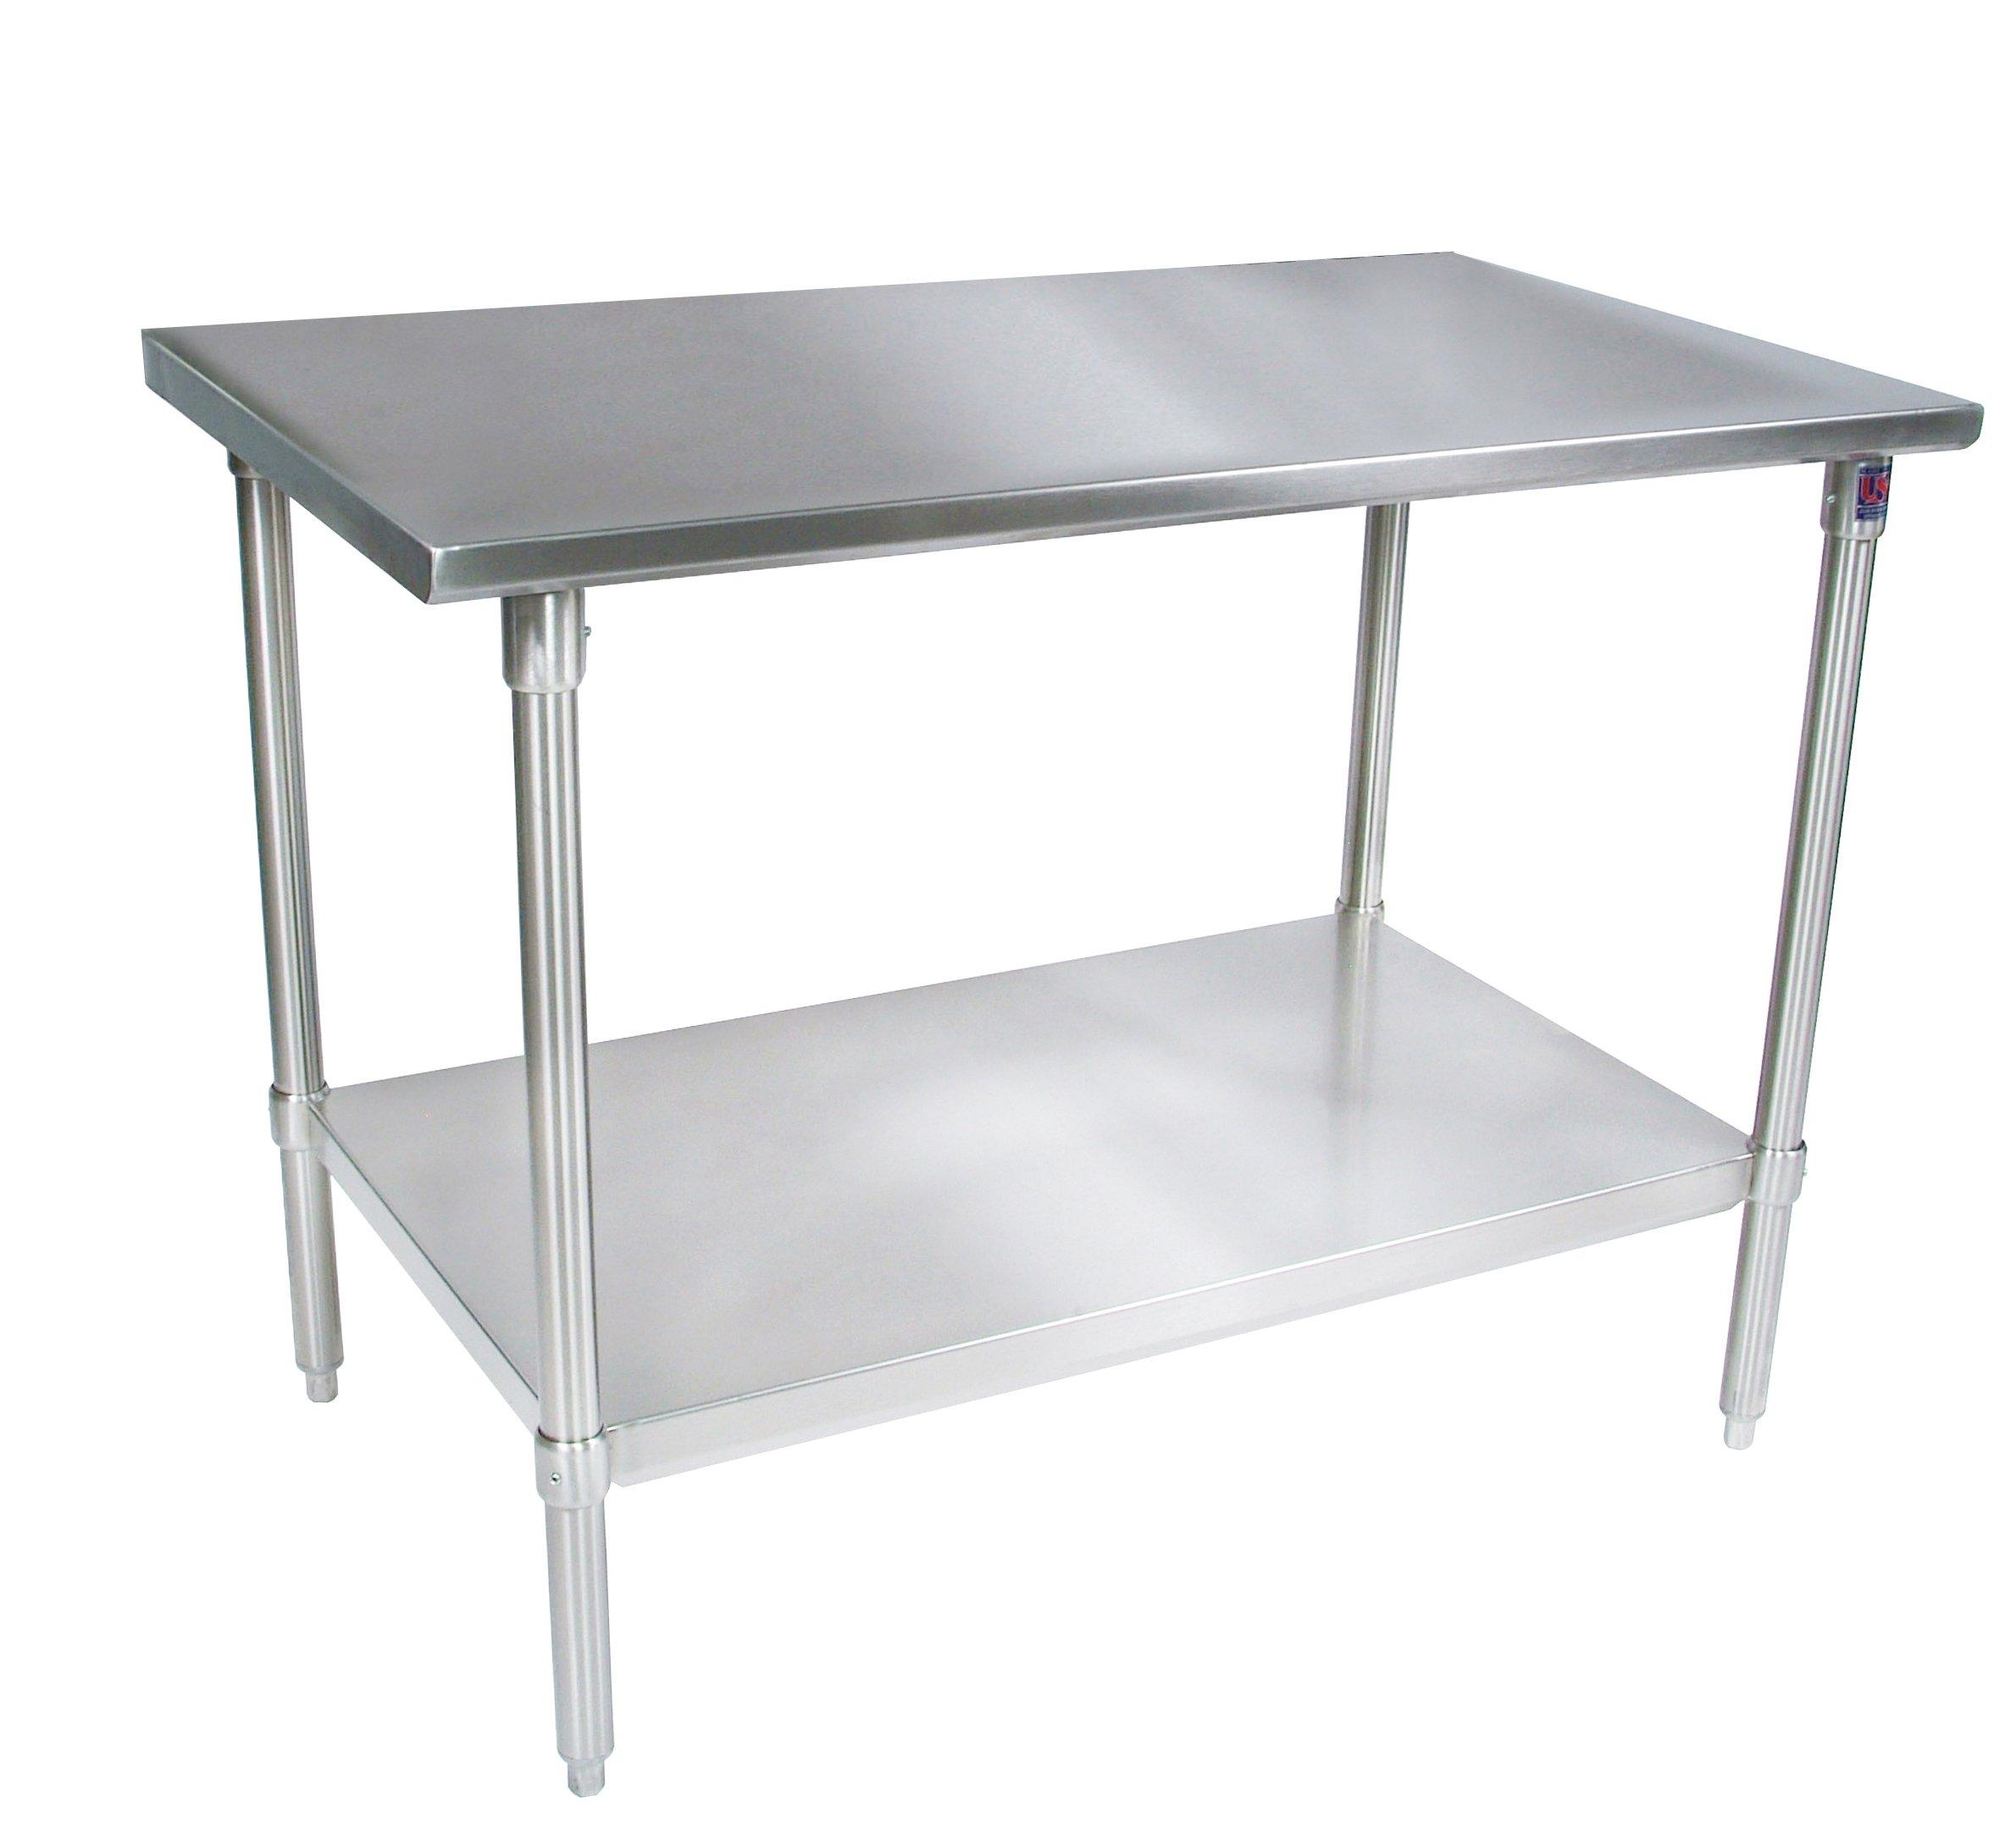 John Boos ST6-3072GSK Stainless Steel Stallion Work Table with Lower Shelf, Adjustable Galvanized Legs, Flat Top, 72'' Length x 30'' Width